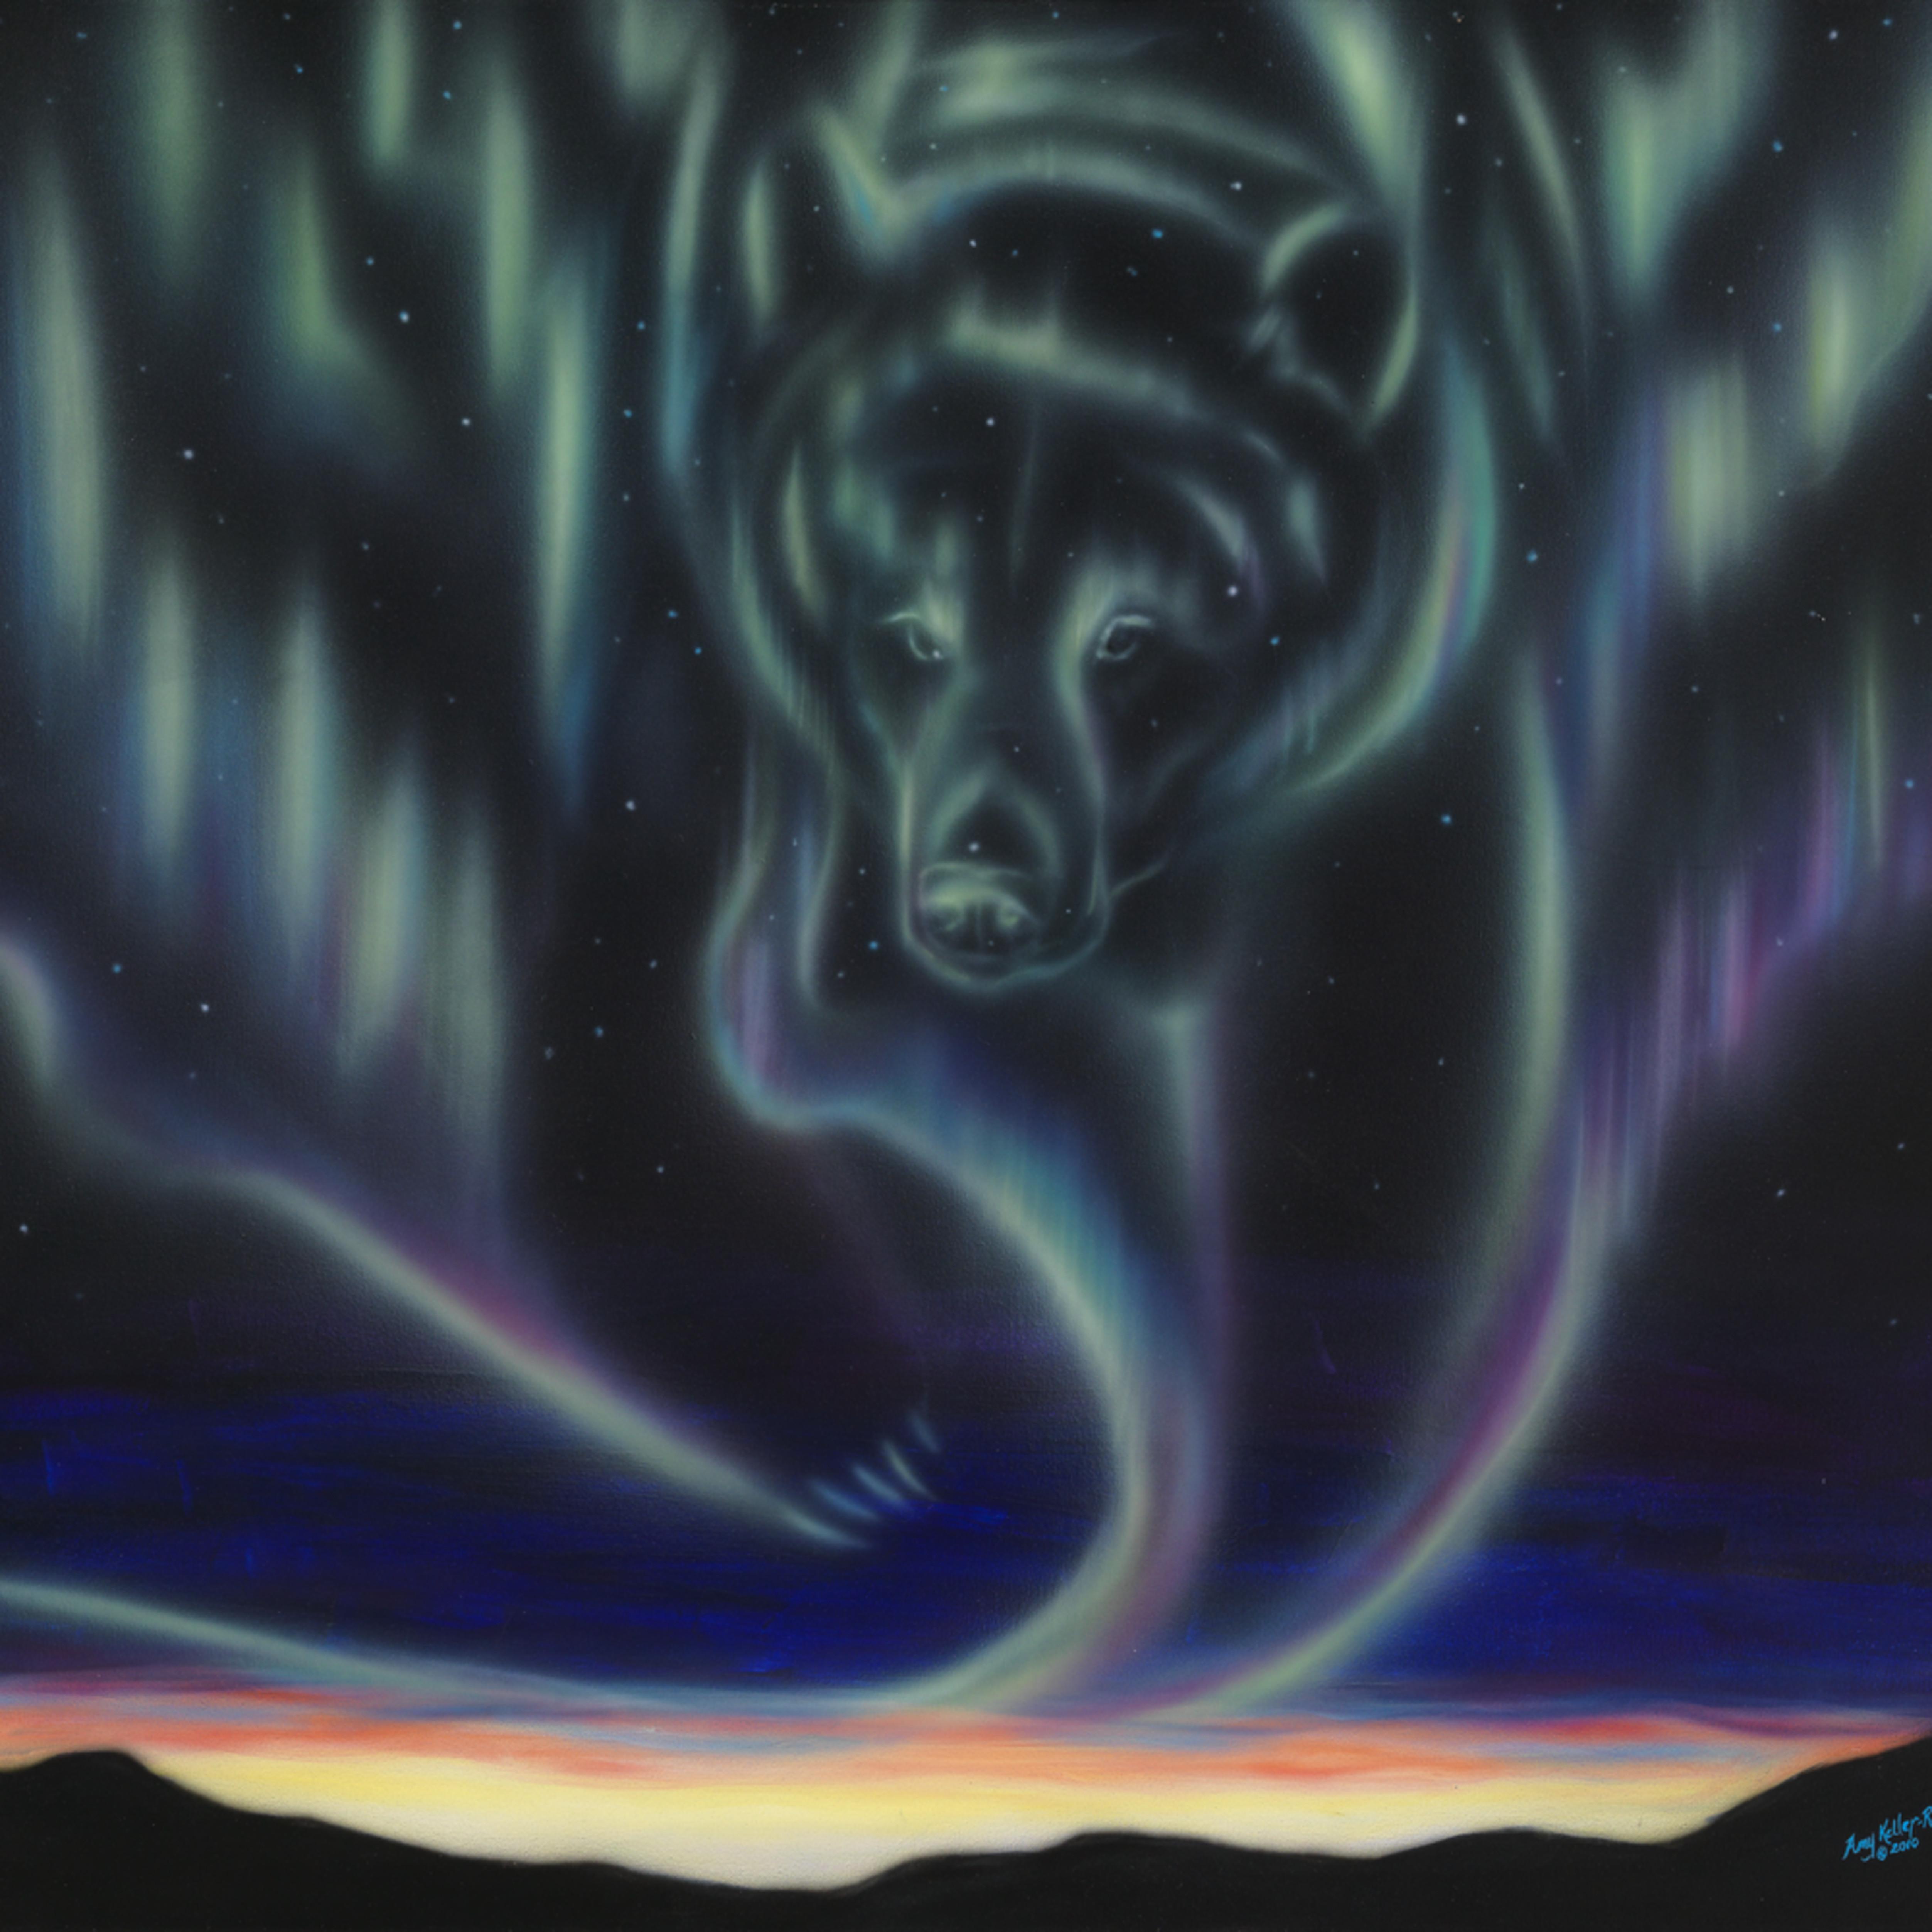 Skydance bear x3b5is